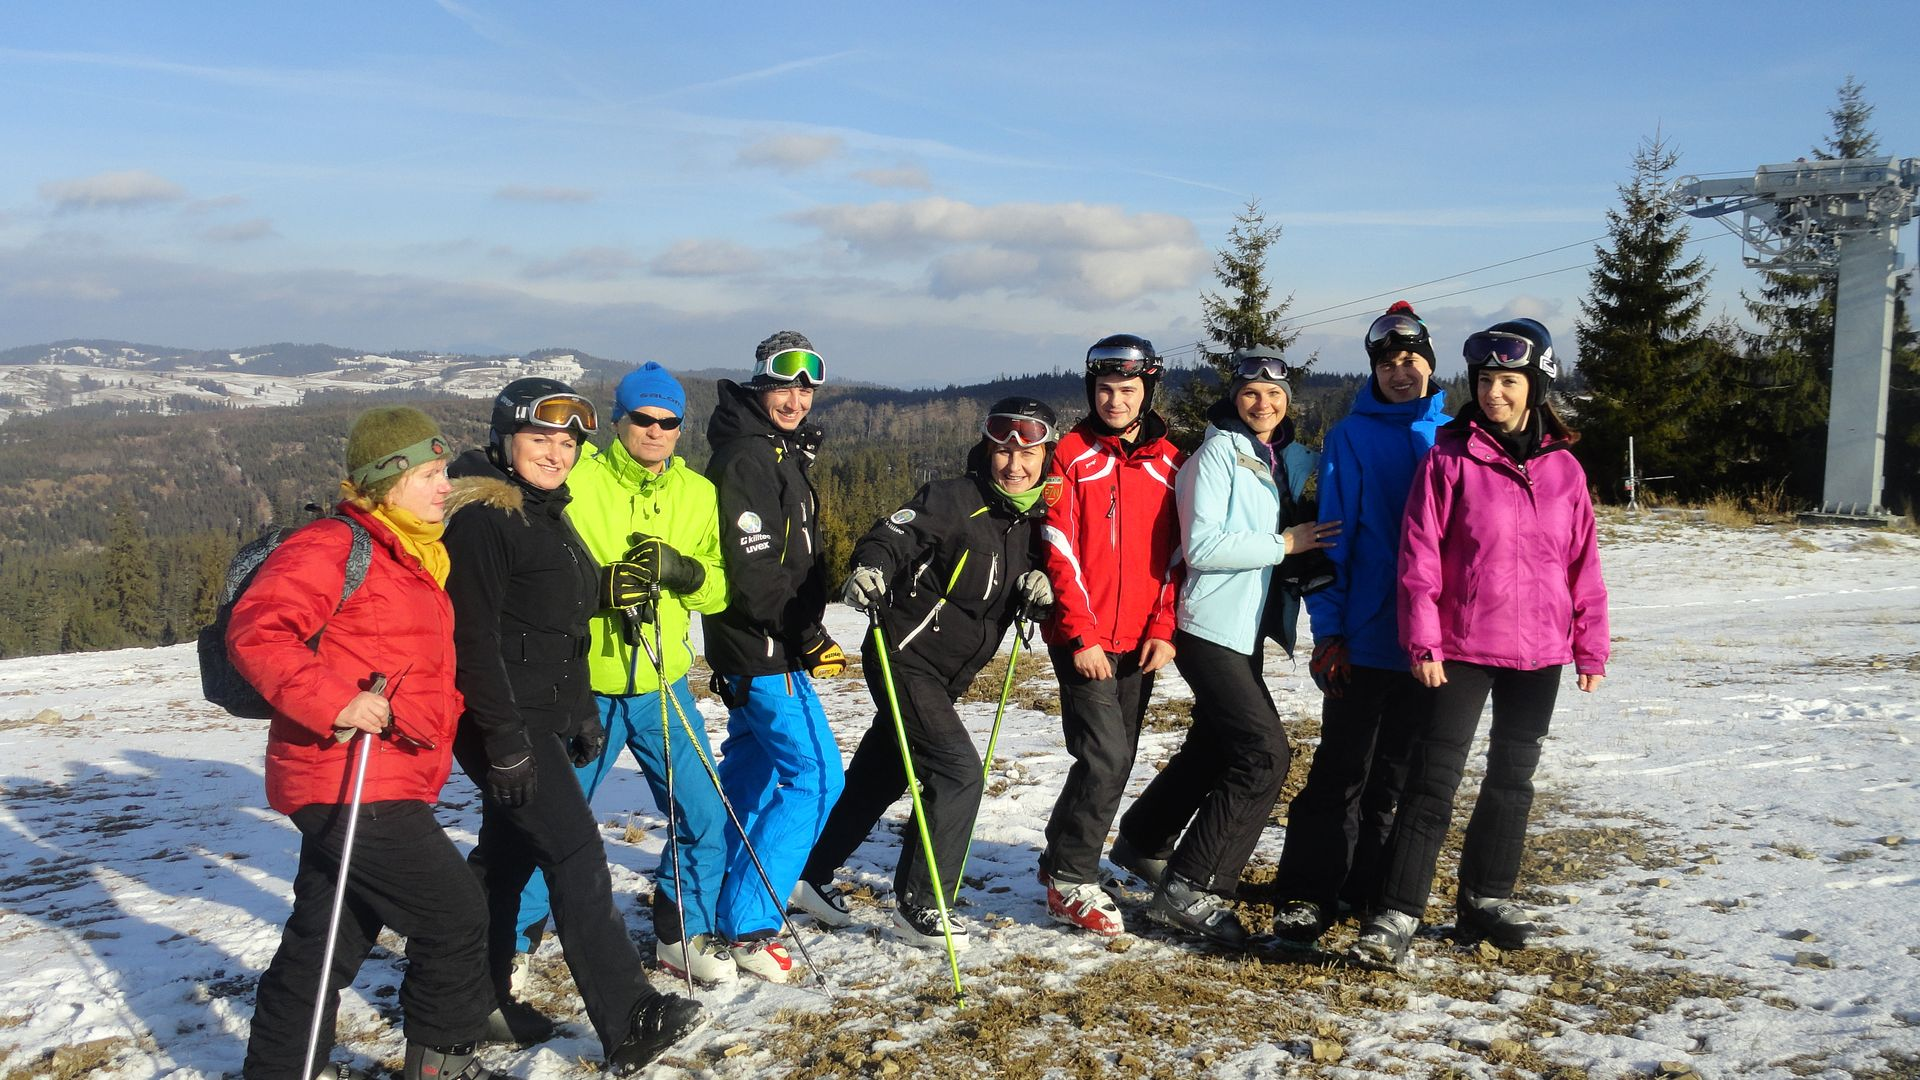 CarTourist_narty-snowboard_2014-foto-18